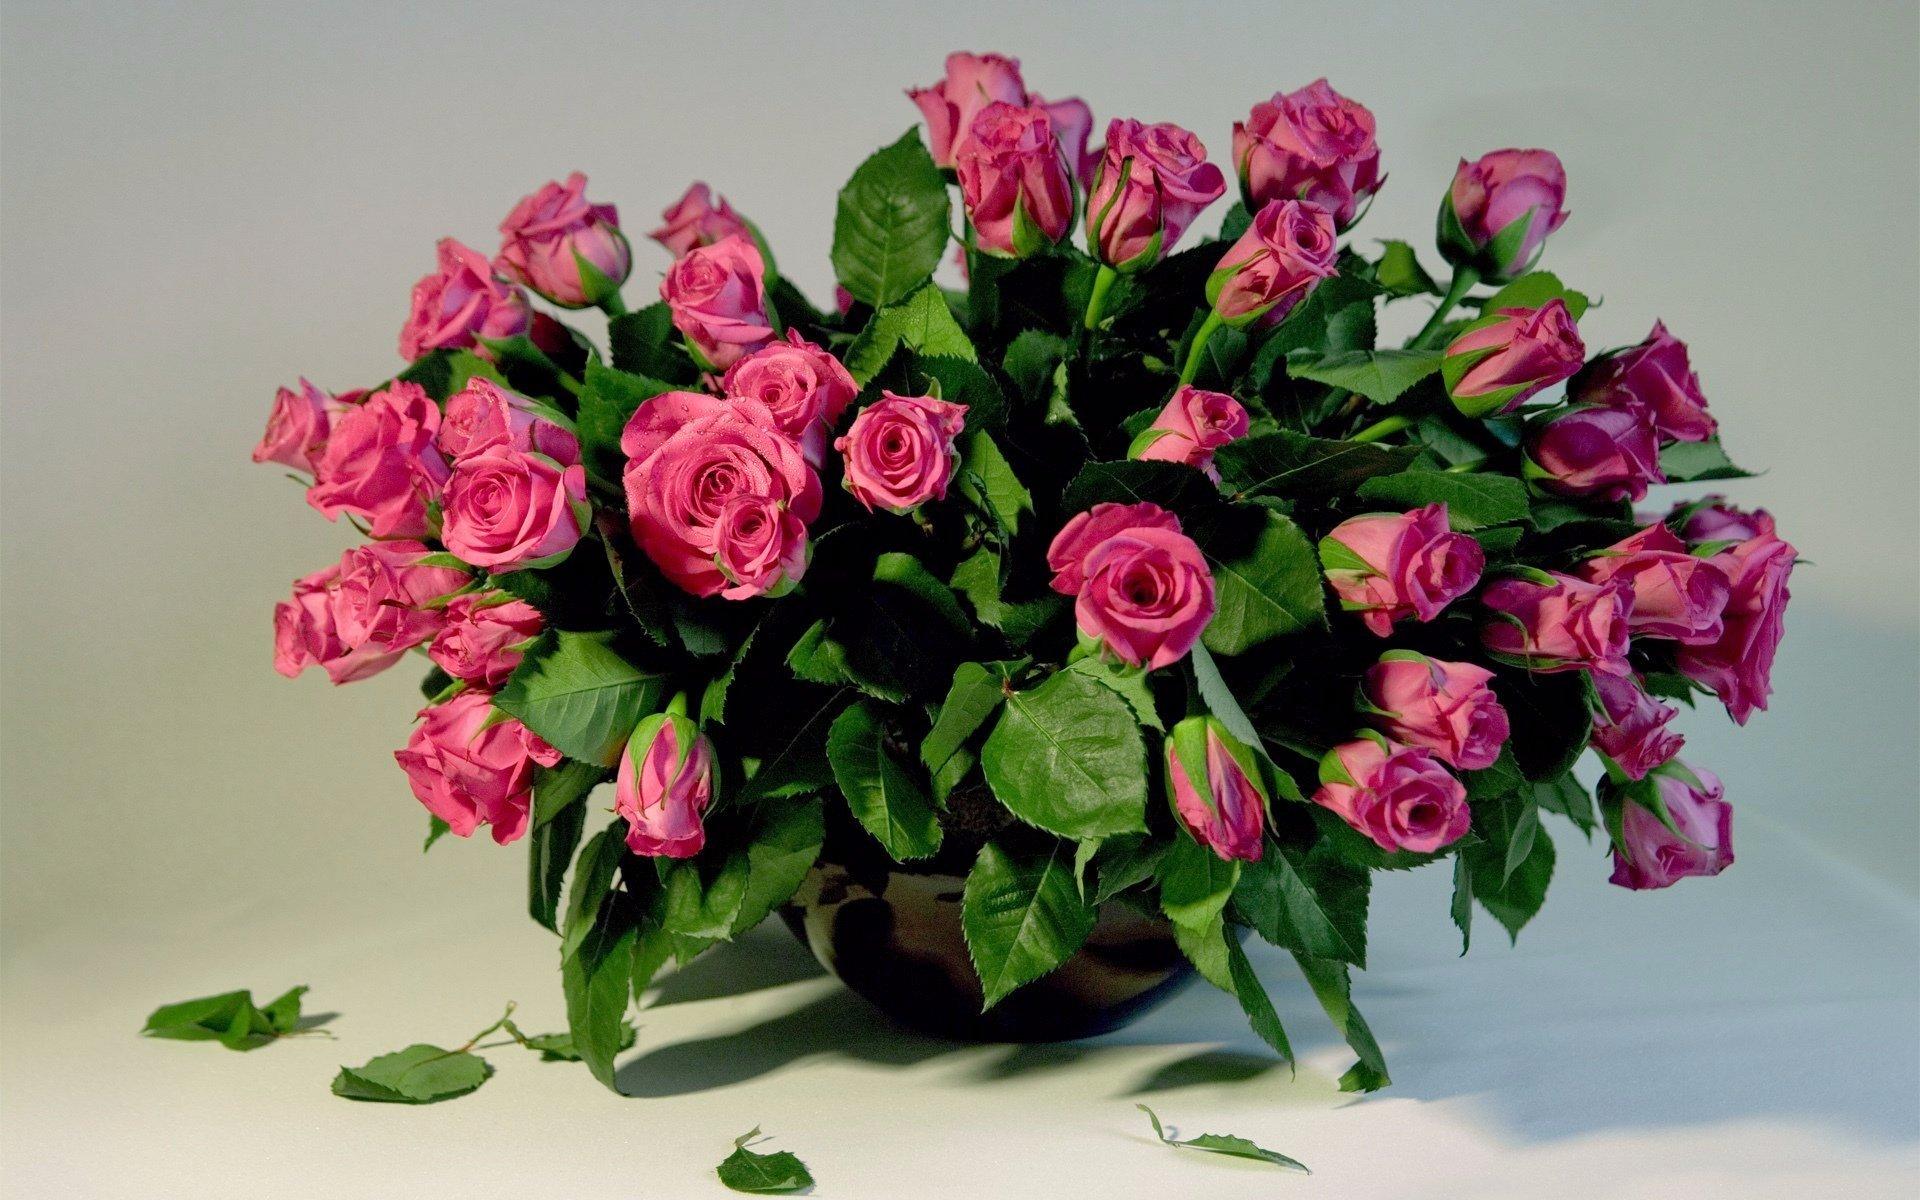 Free download flower bouquet background id179896 hd 1920x1200 for free download flower bouquet background id179896 hd 1920x1200 for desktop izmirmasajfo